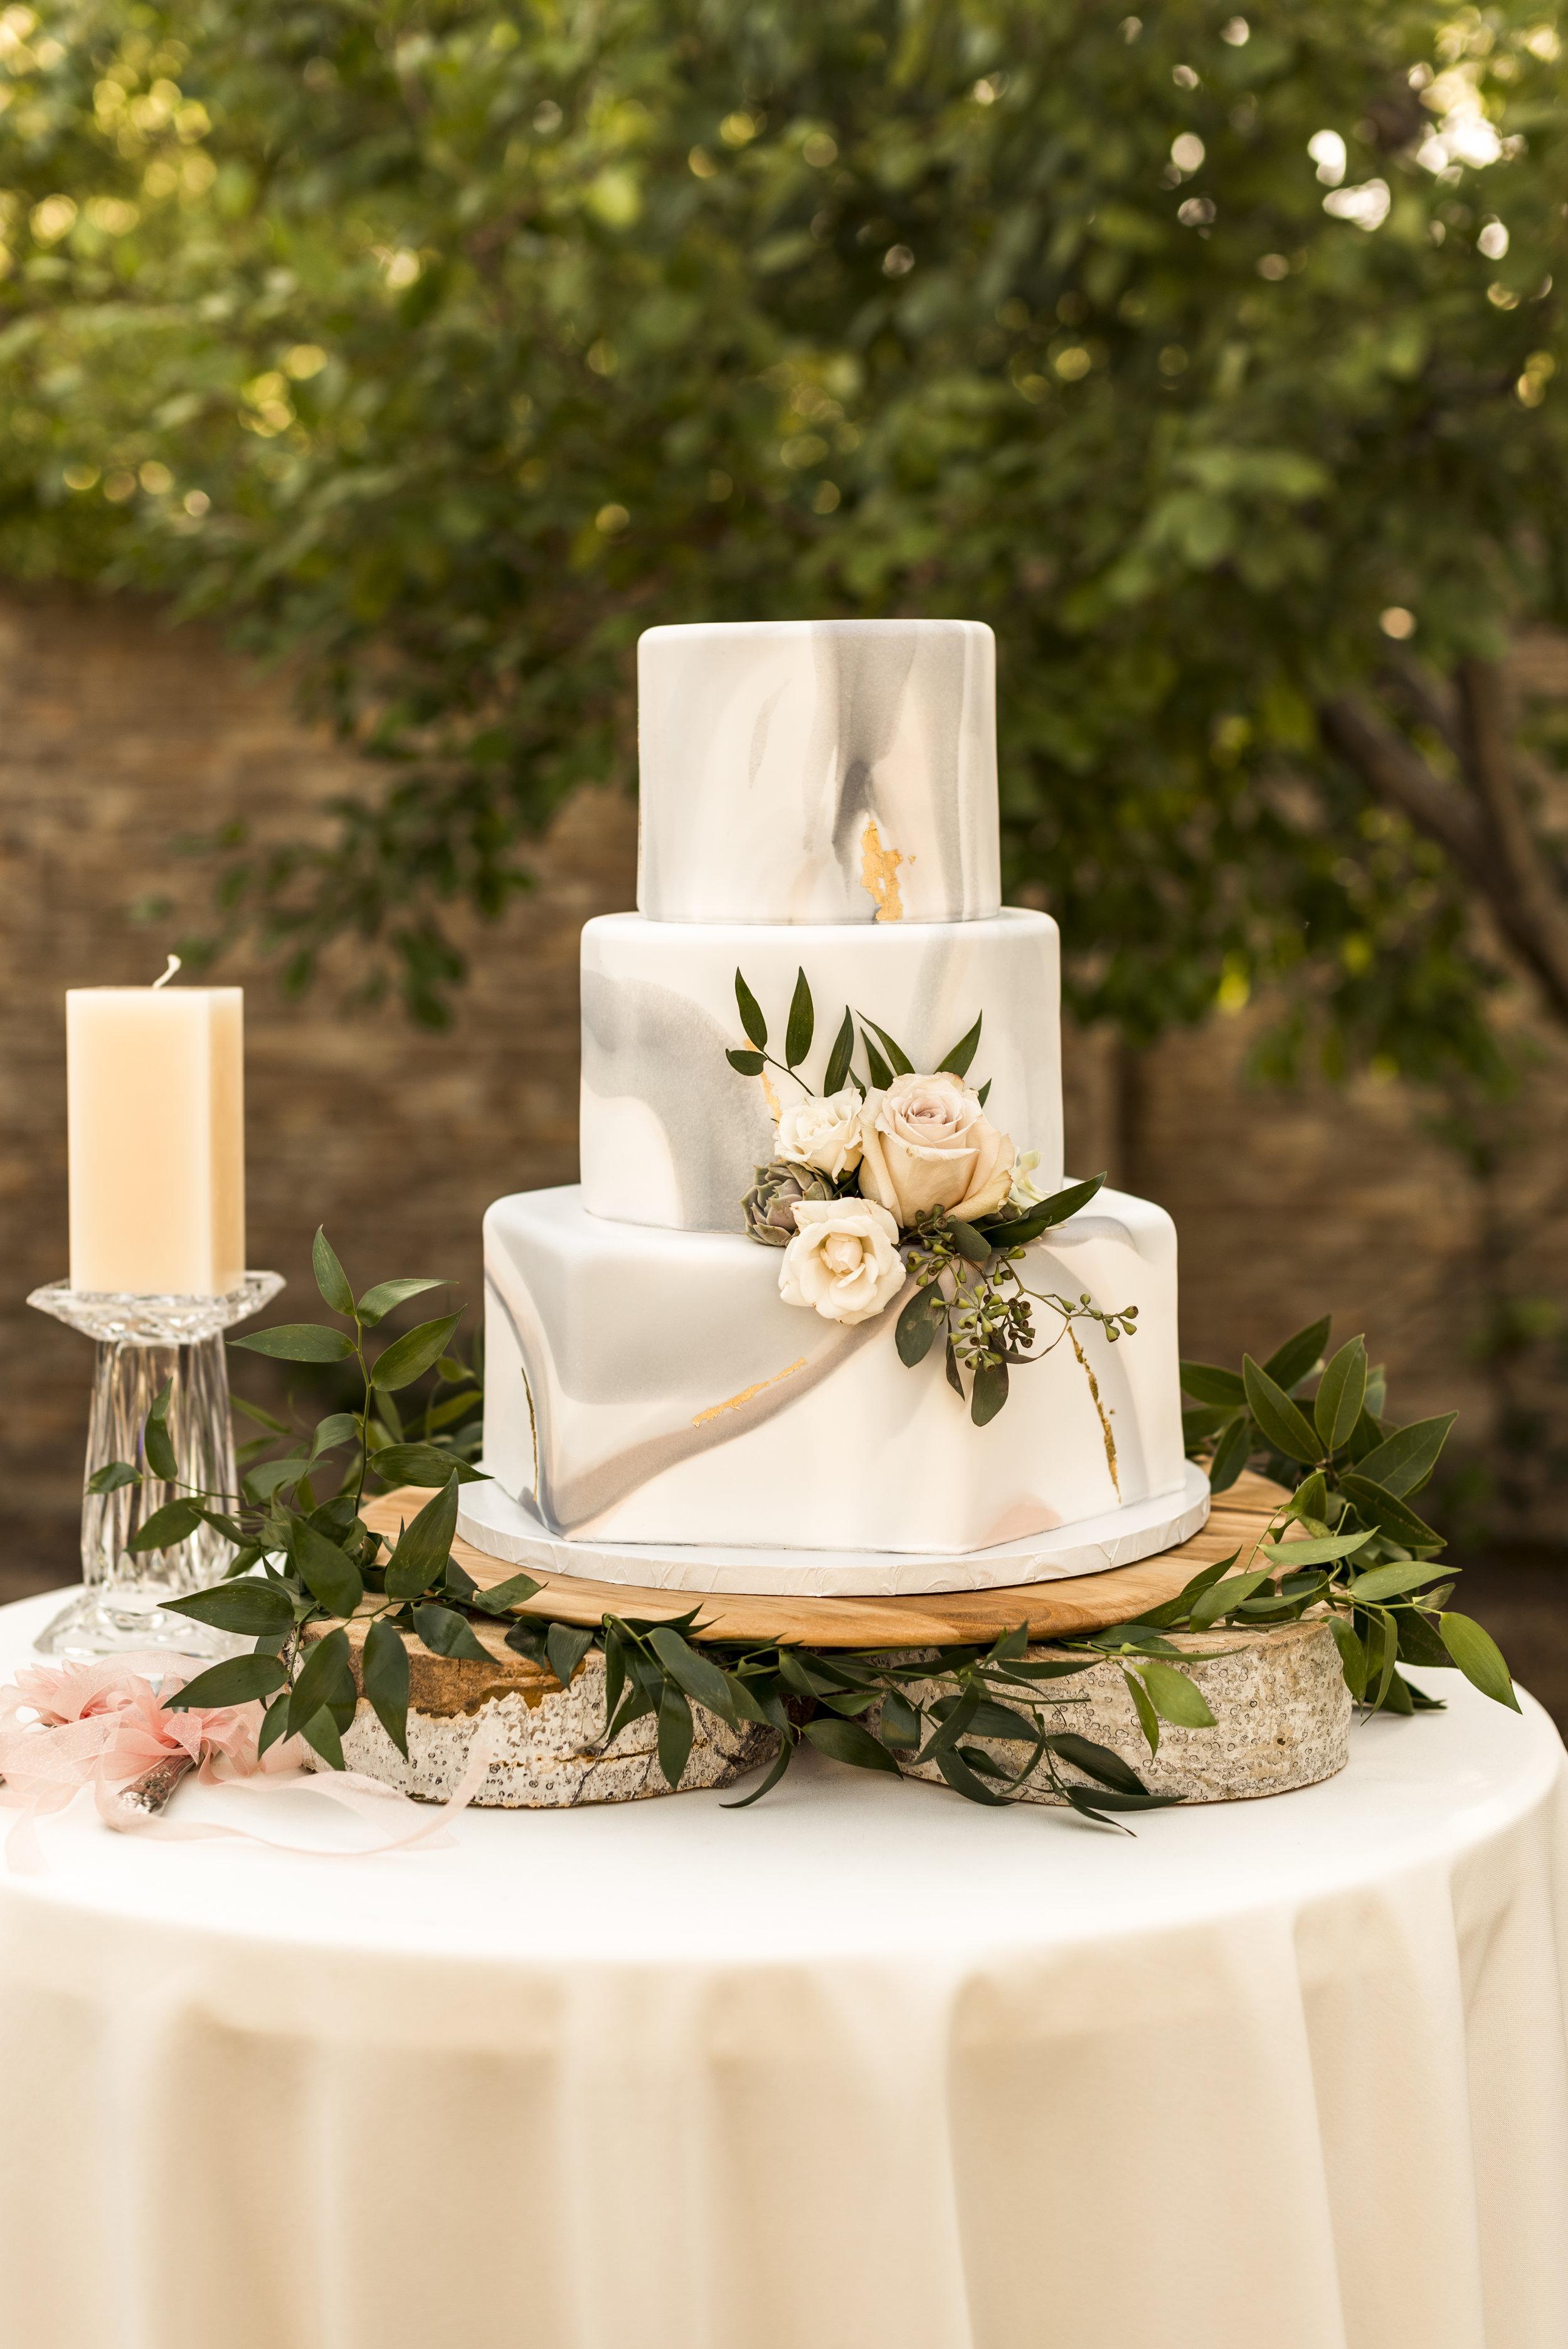 LDS Summer Wedding | South Jordan, Utah Wedding Photographer| Bri Bergman Photography 15.JPG